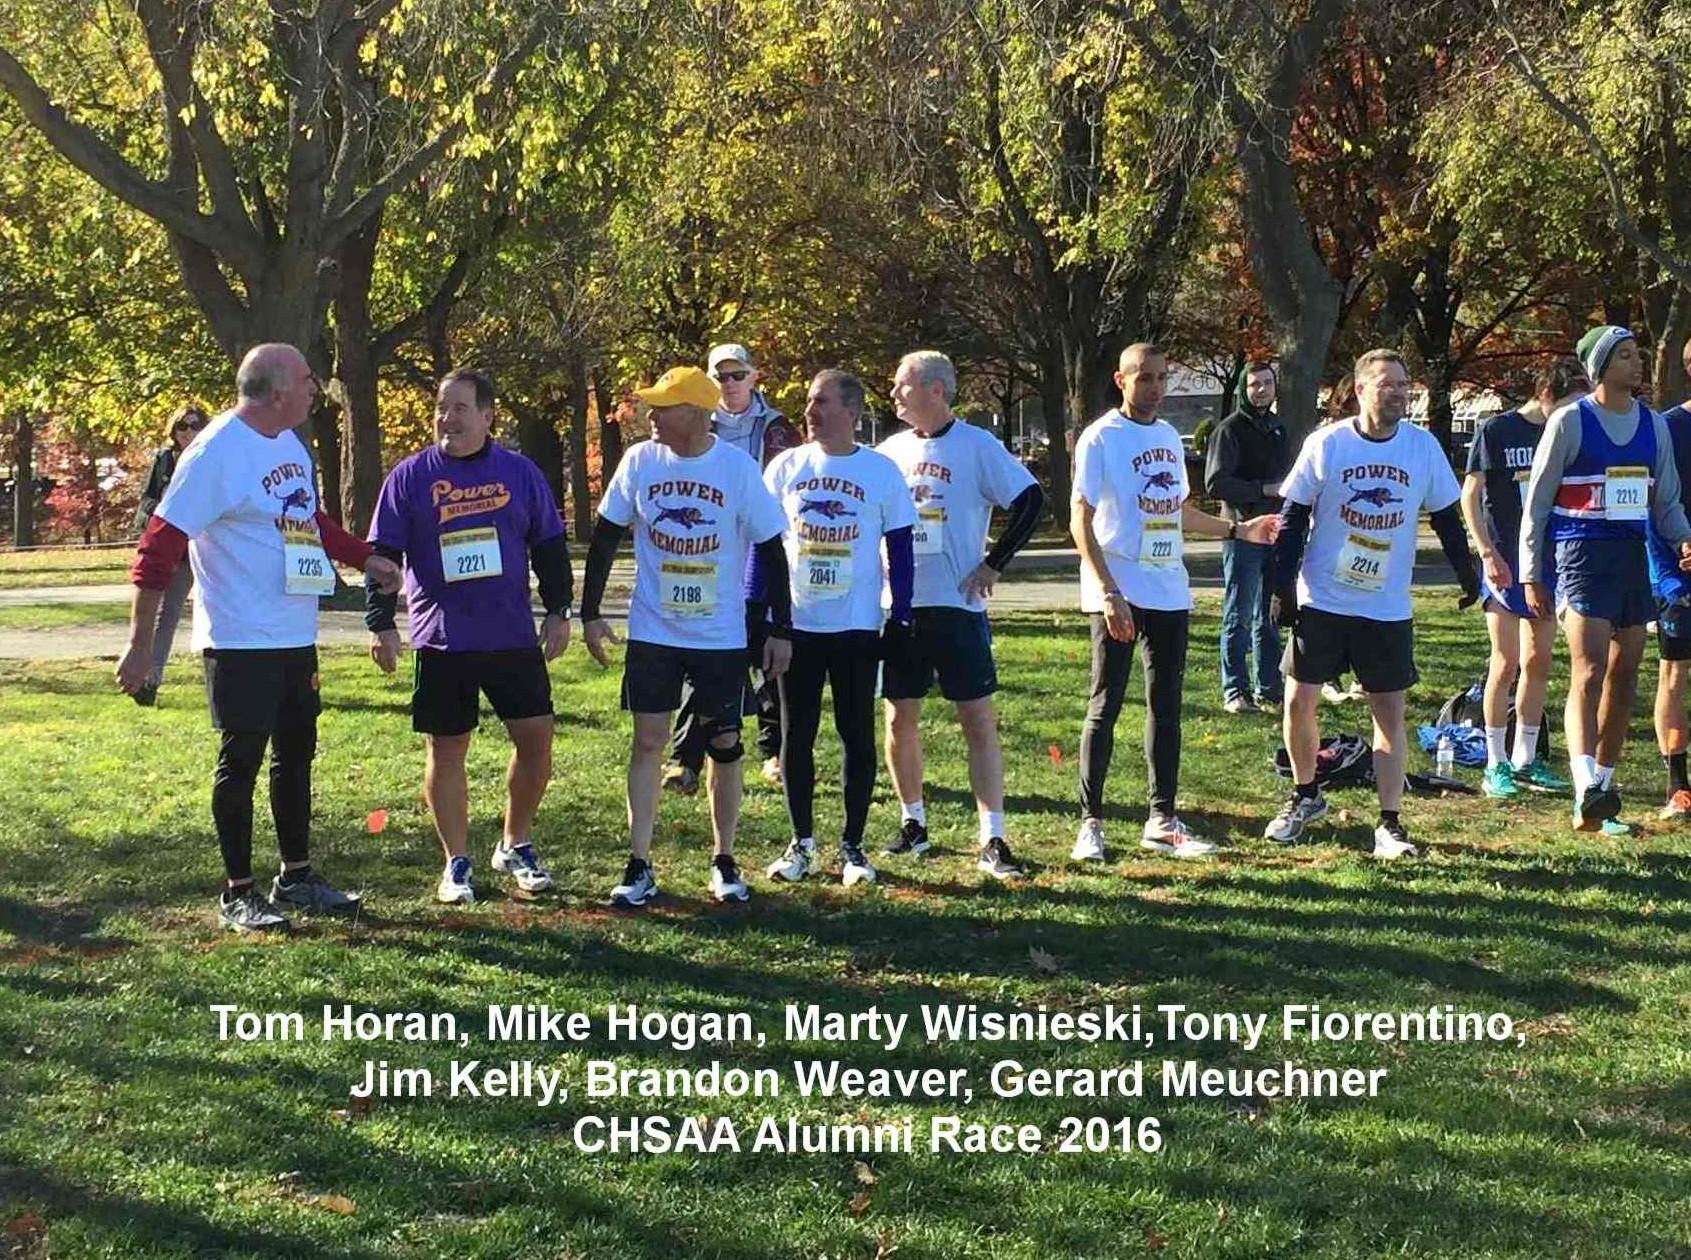 aPower Guys on line_alumni race 2016